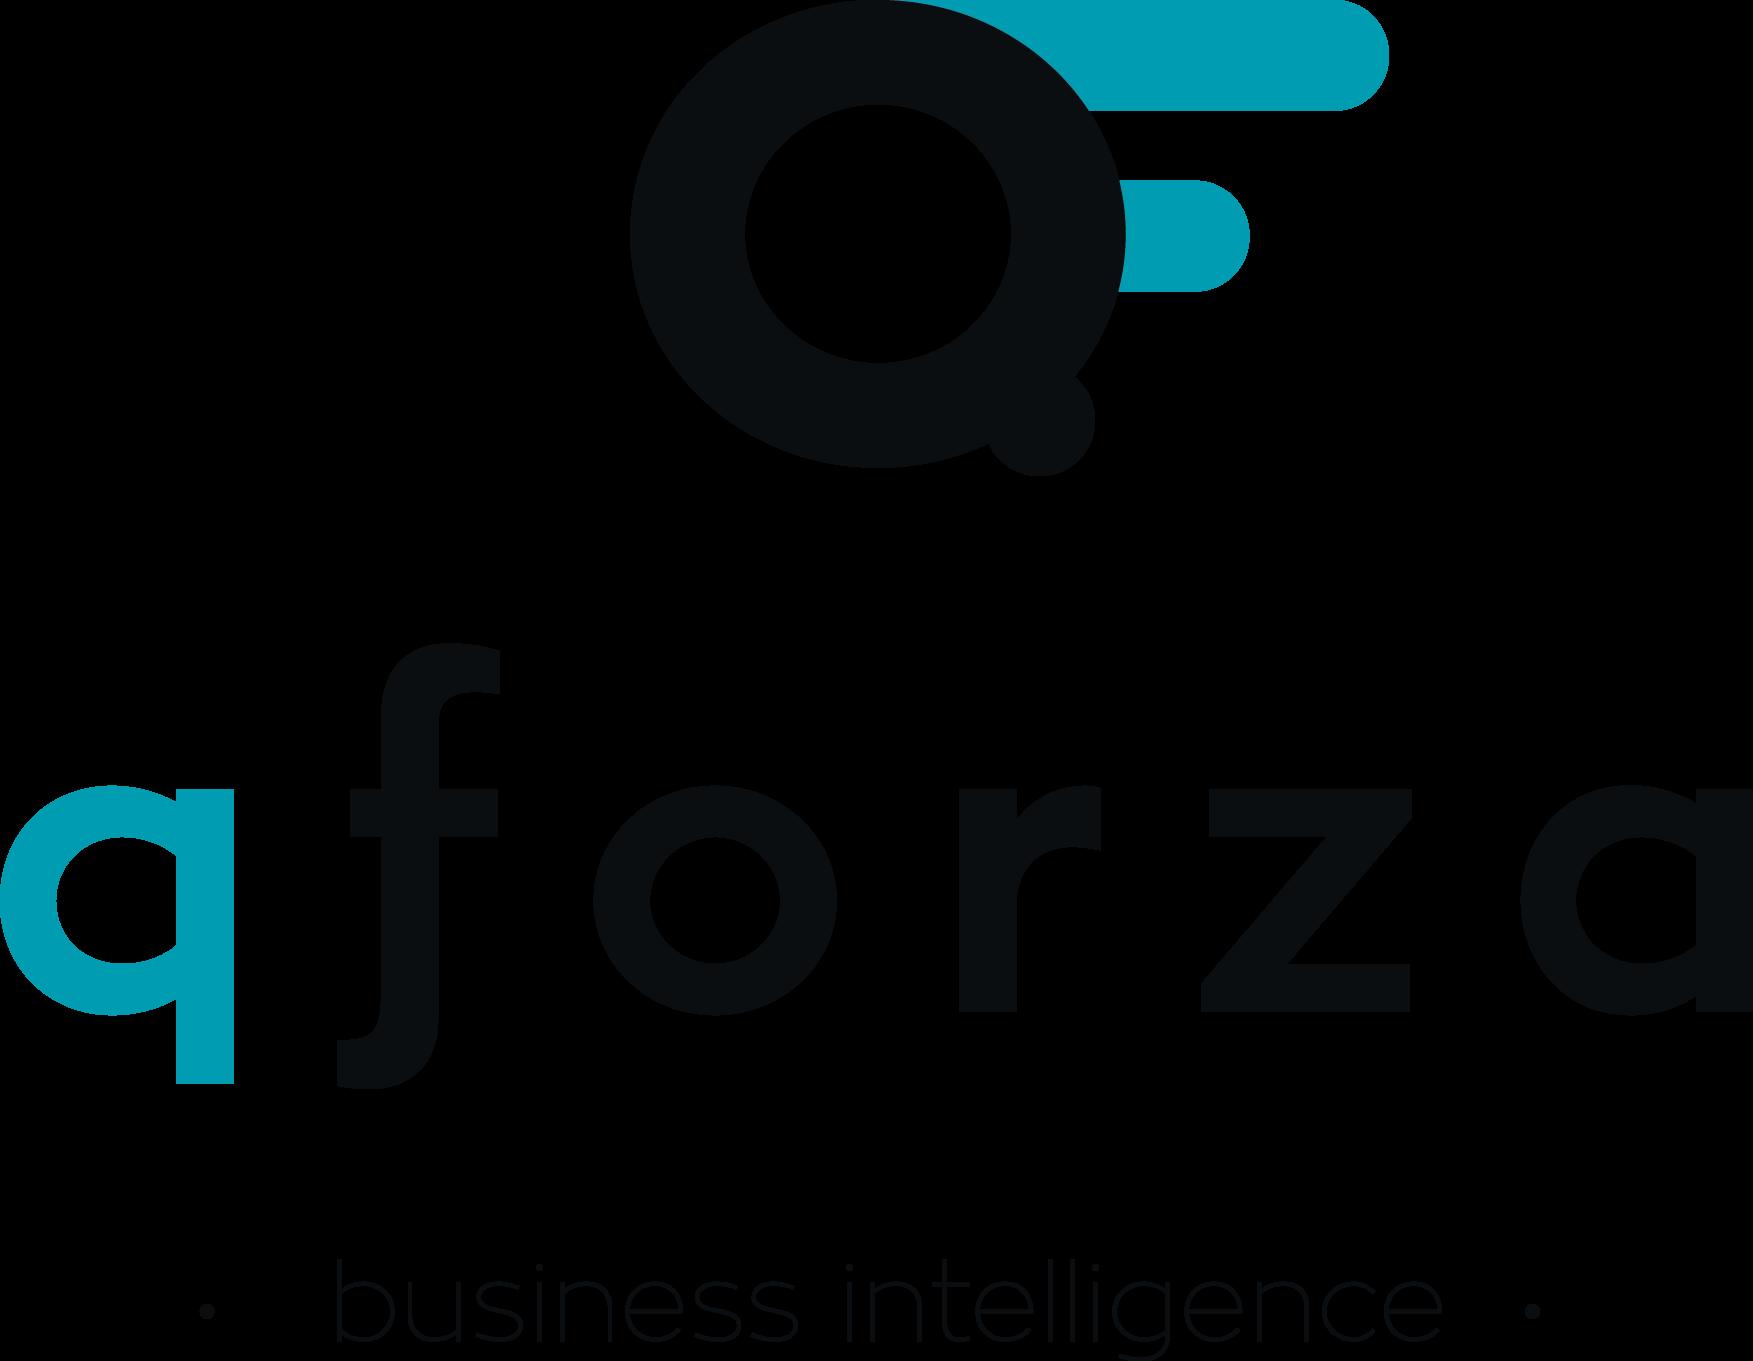 qForza - Business Intelligence